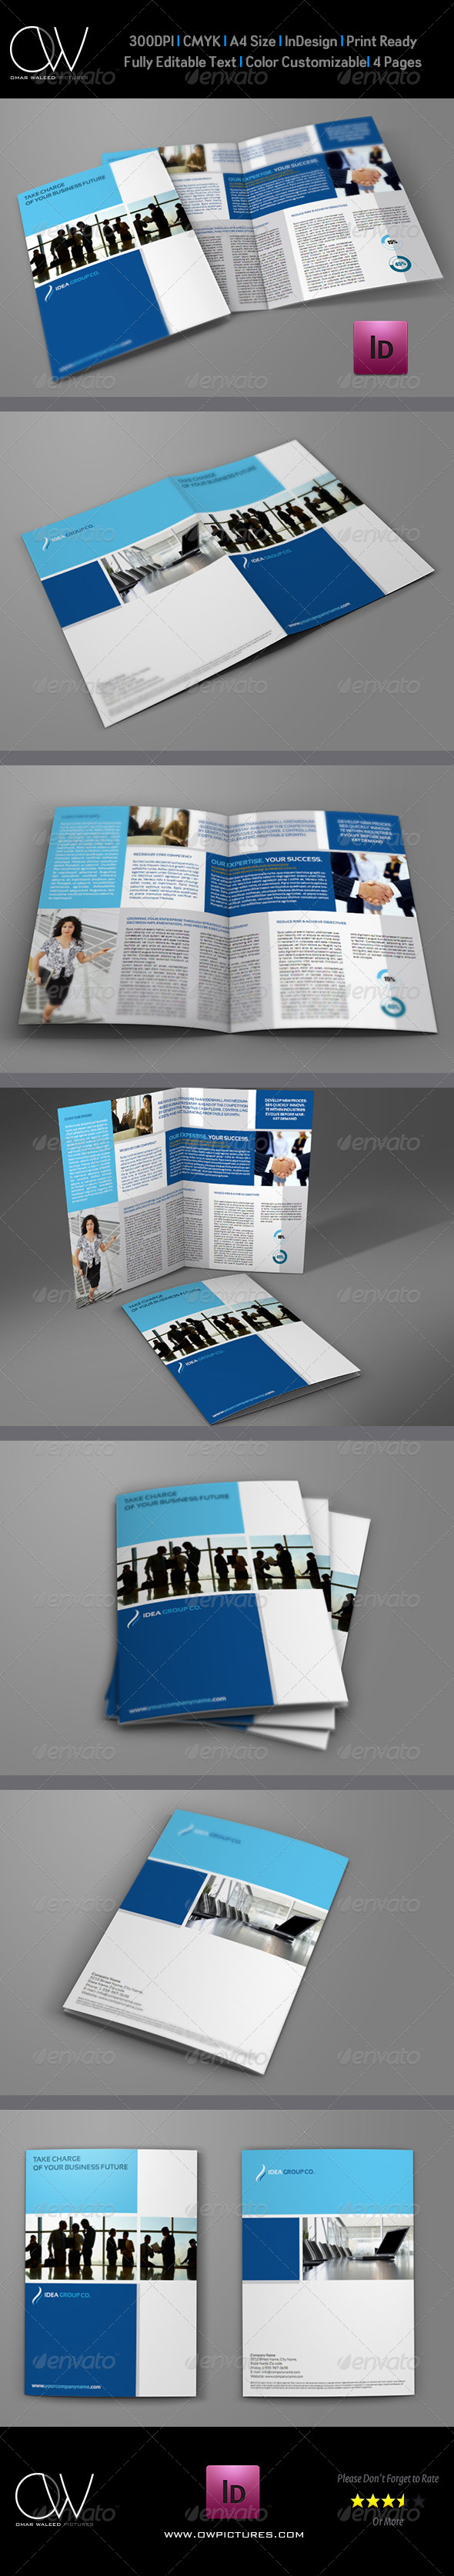 Company Brochure Bi-Fold Template Vol.2 - Corporate Brochures